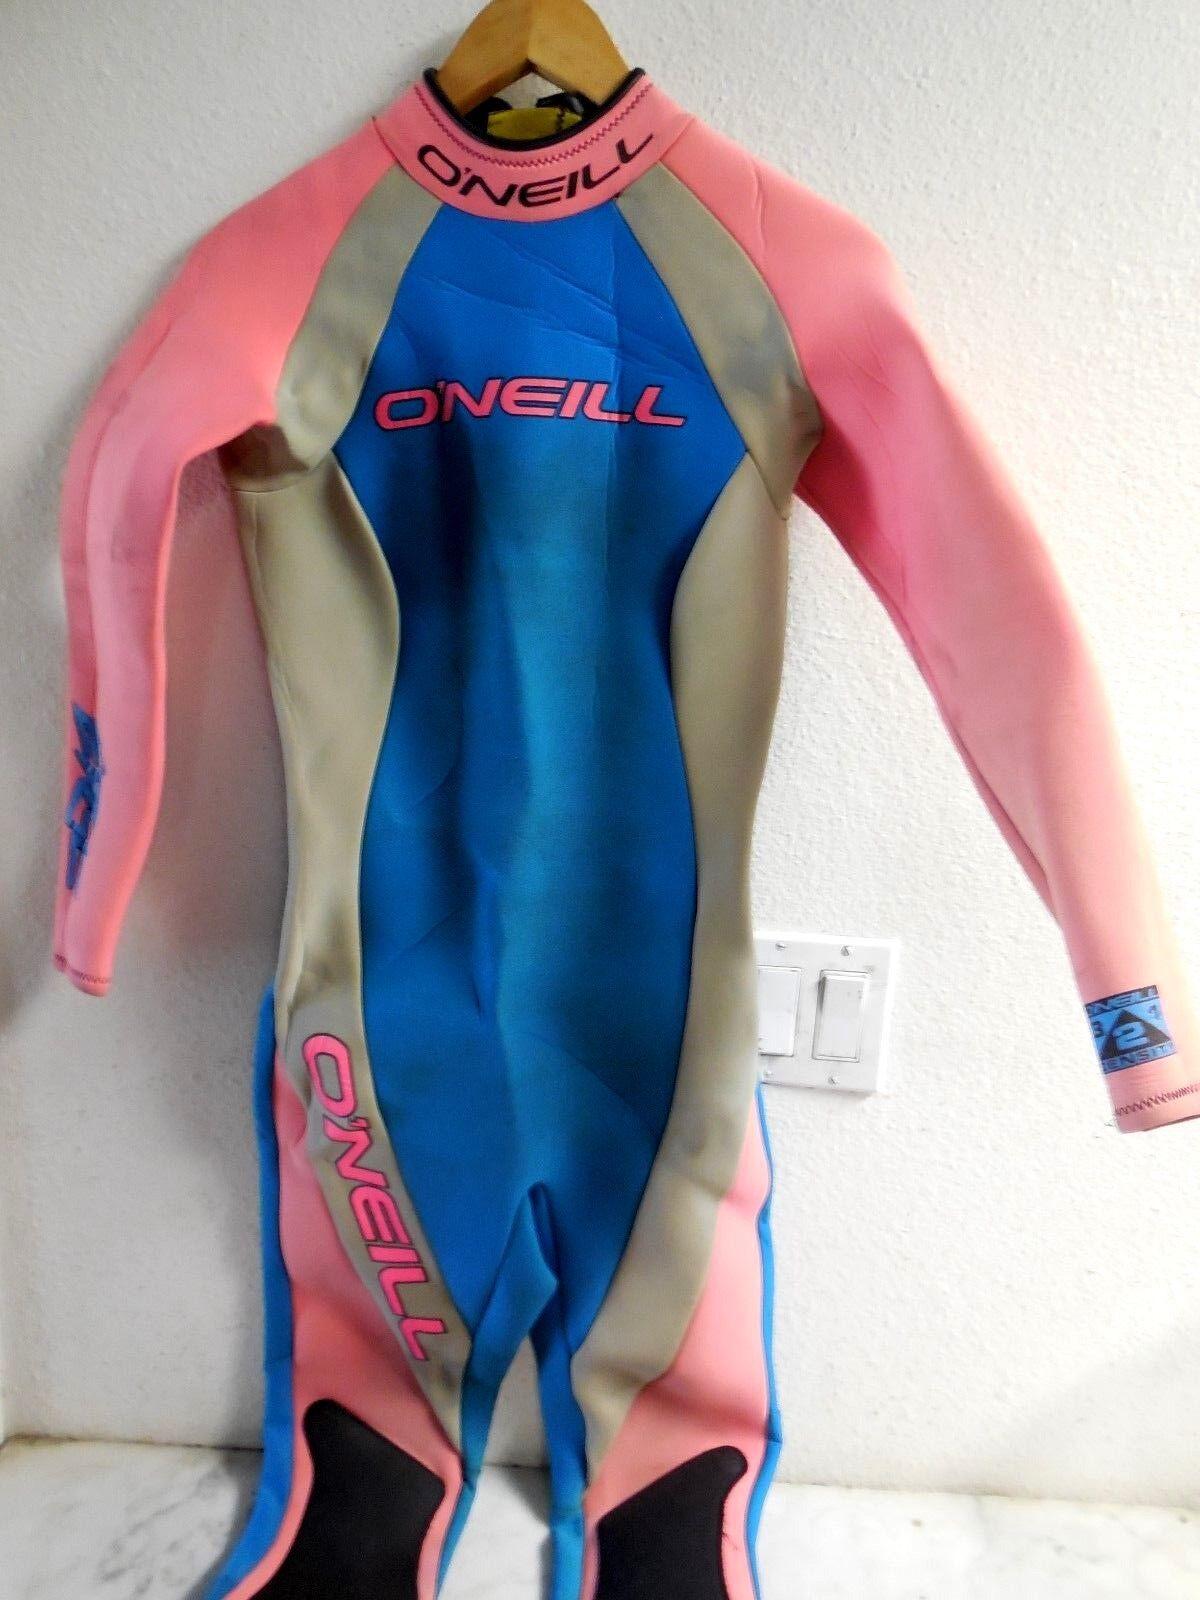 Vintage Retro Oneill The Edge Neon Pink bluee 3  2 Surf Scuba Wetsuit Dive Sz W 10  luxury brand